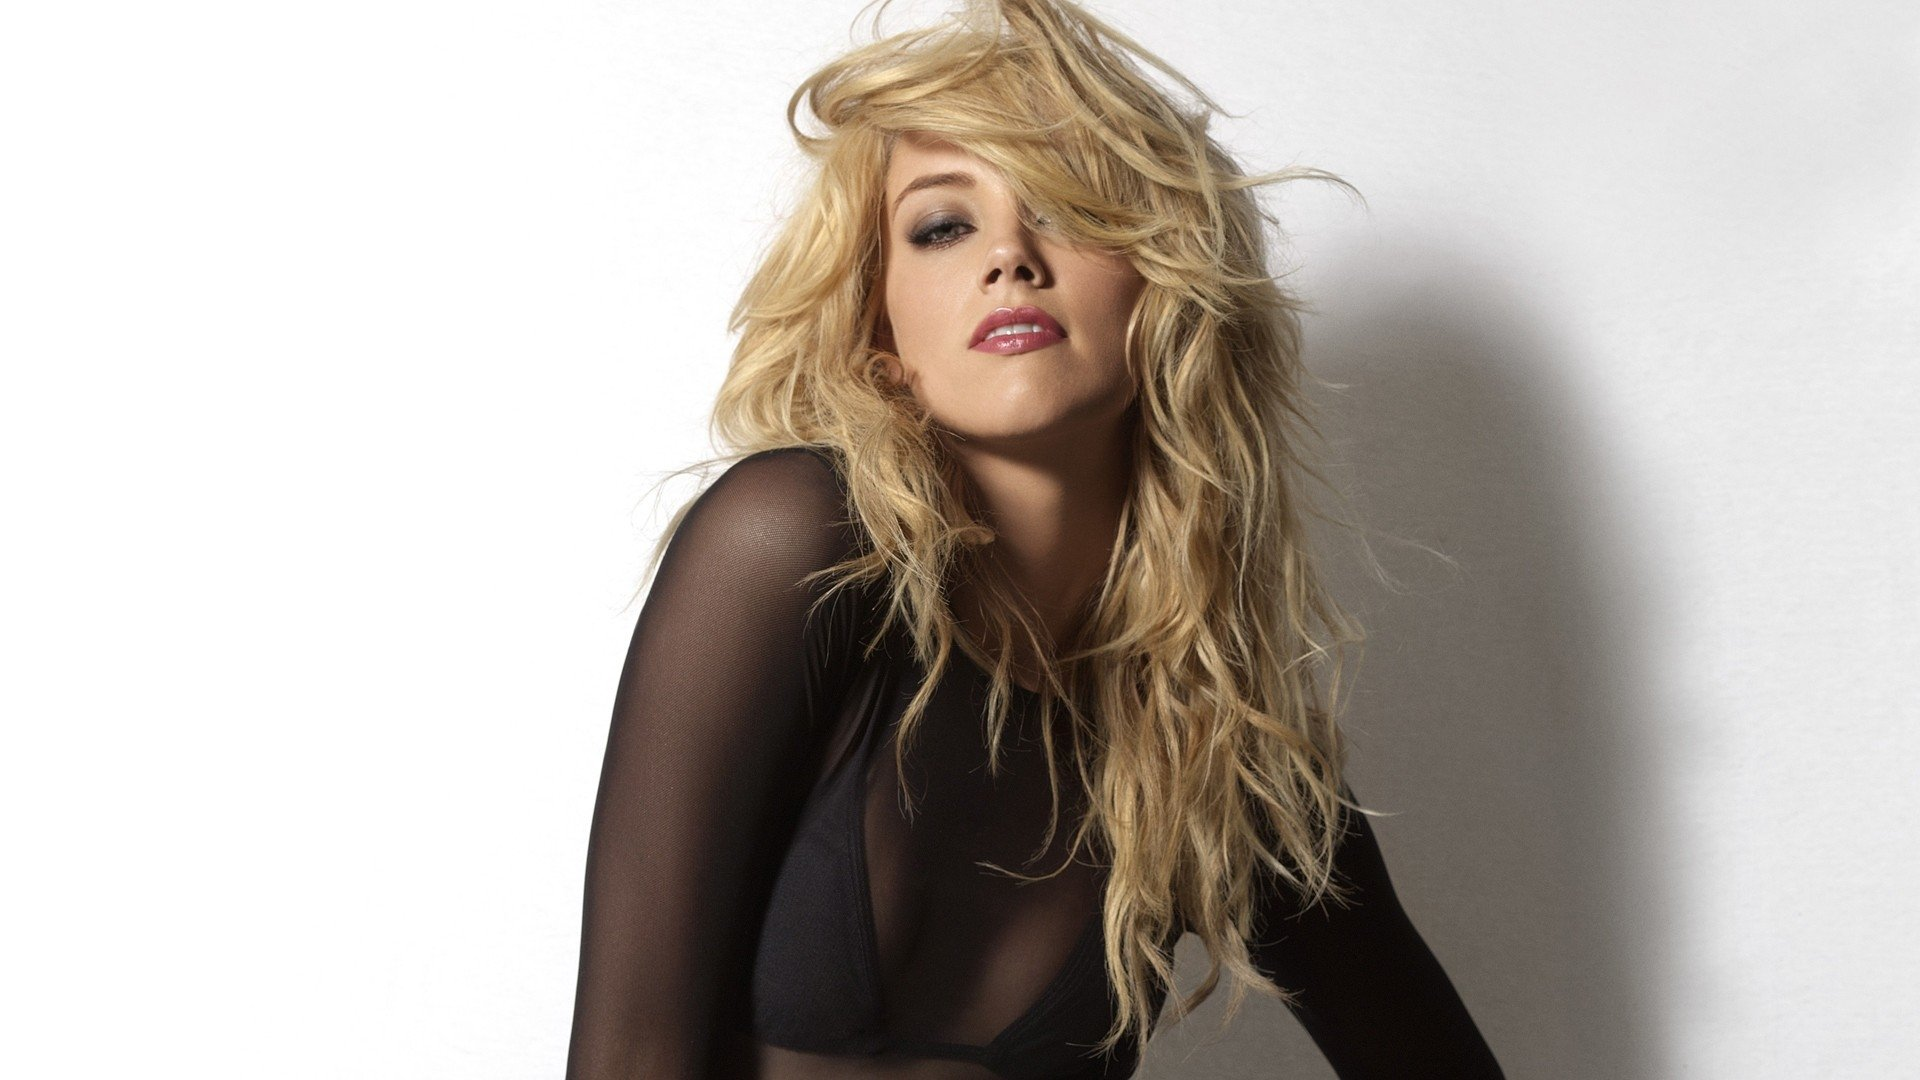 Amber Heard Wallpaper Mobile , HD Wallpaper & Backgrounds